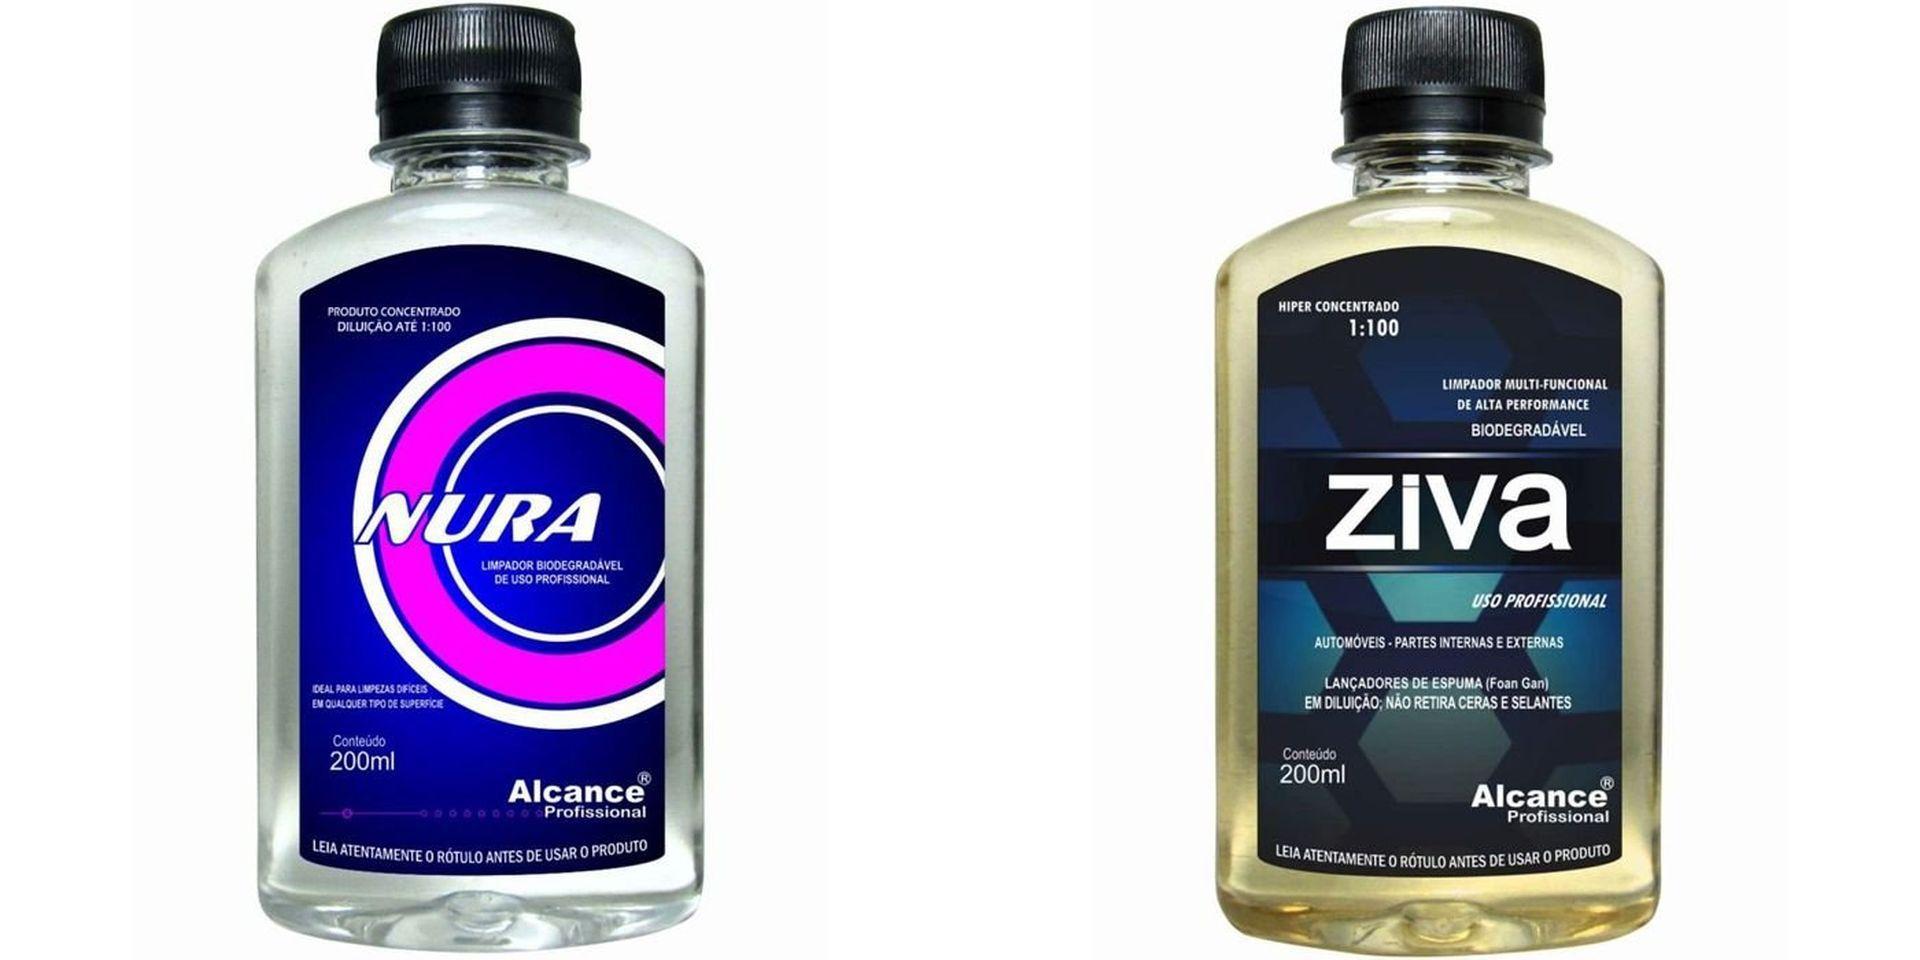 Kit Limpador Multi-funcional Ziva+Limpador Biodegradável Nura